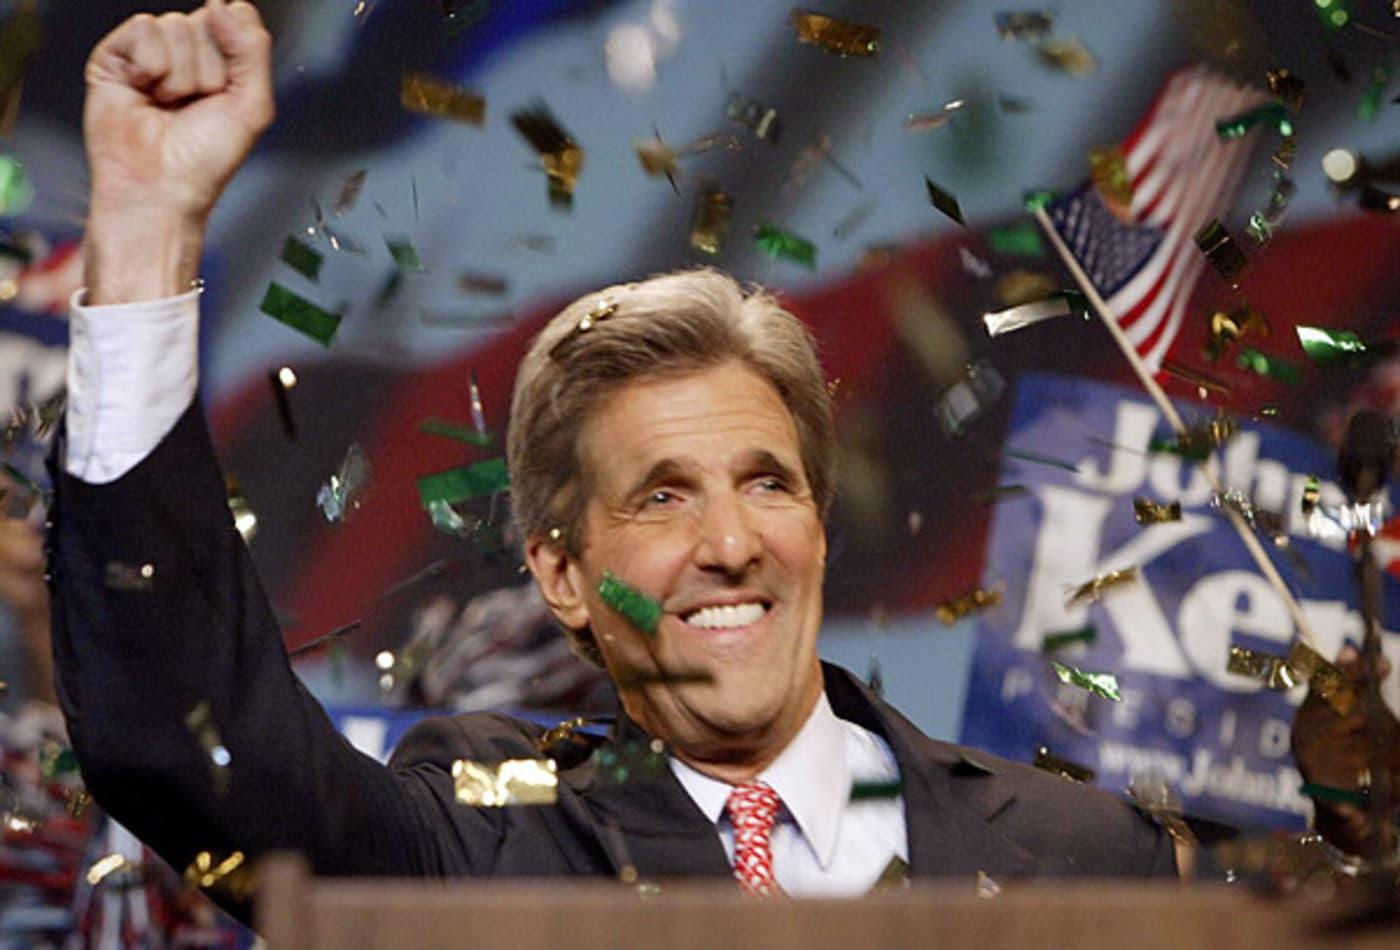 John-Kerry-Richest-Presidential-Candidates.jpg